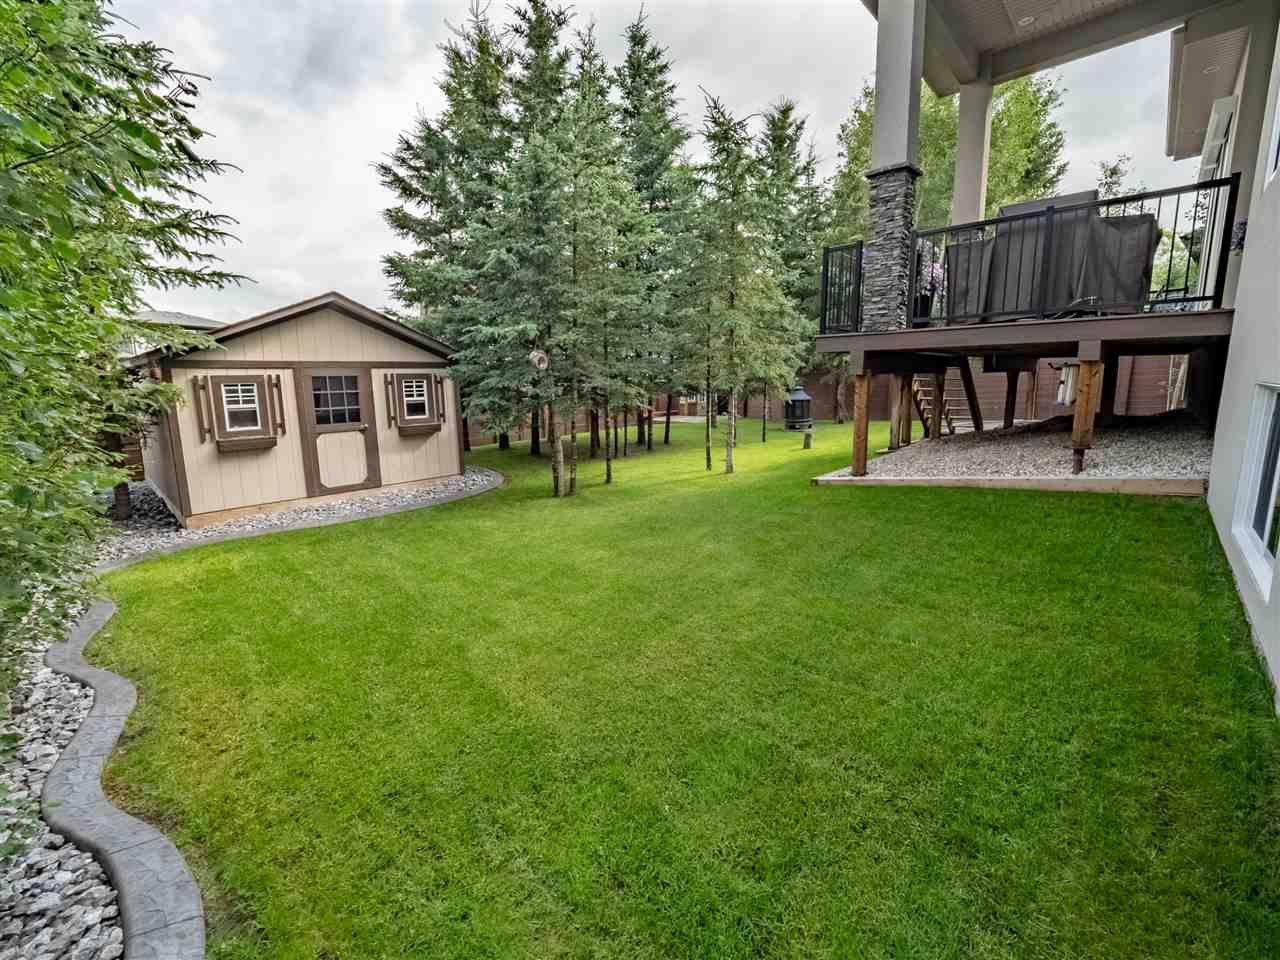 Photo 5: Photos: 58 Kenton Woods Lane NW: Spruce Grove House for sale : MLS®# E4166439